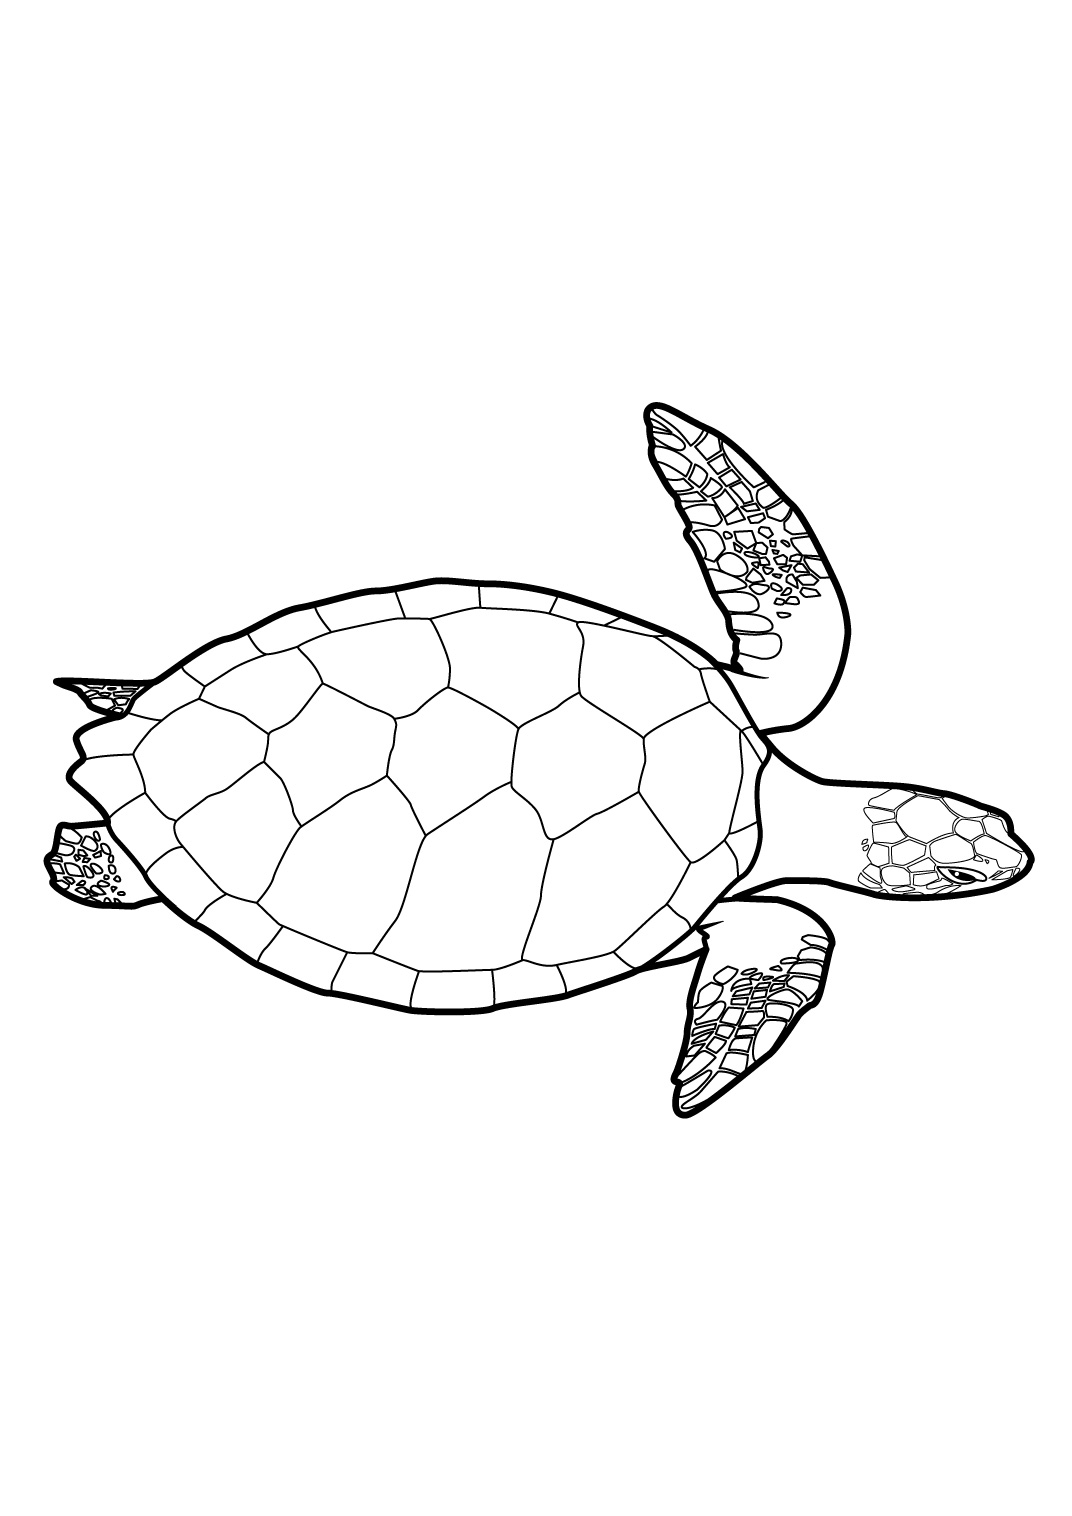 Coloriage tortue dessins colorier imagixs tattoo tattooskid - Tortue a colorier ...